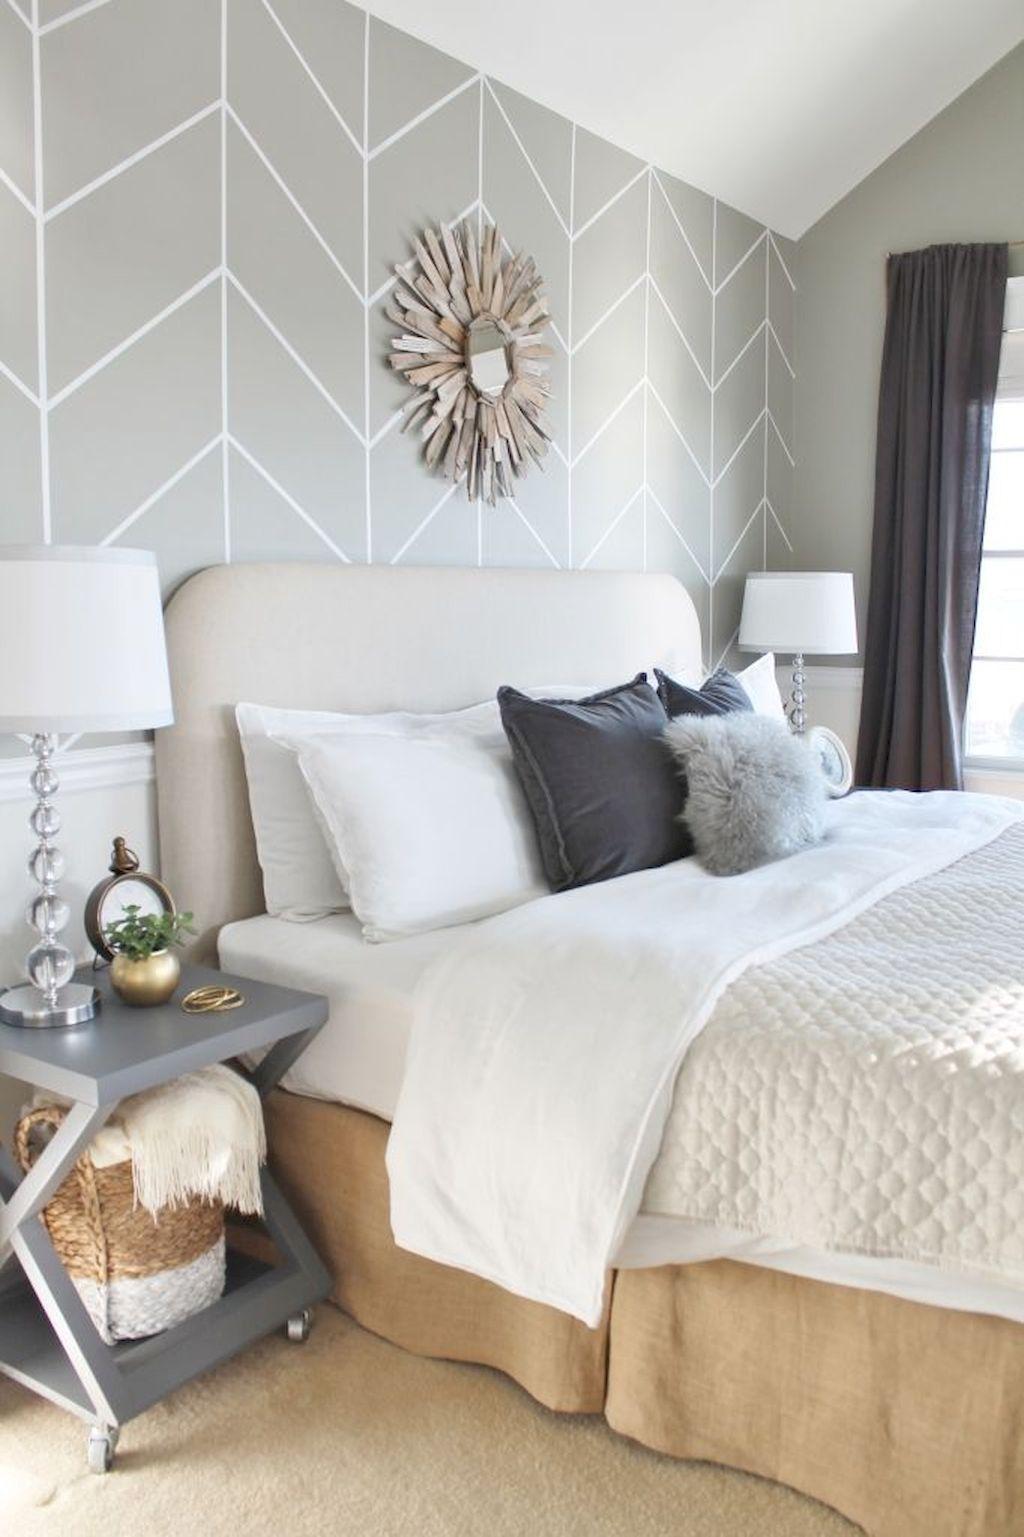 80 Amazing Farmhouse Bedroom Decor Ideas on A Budget